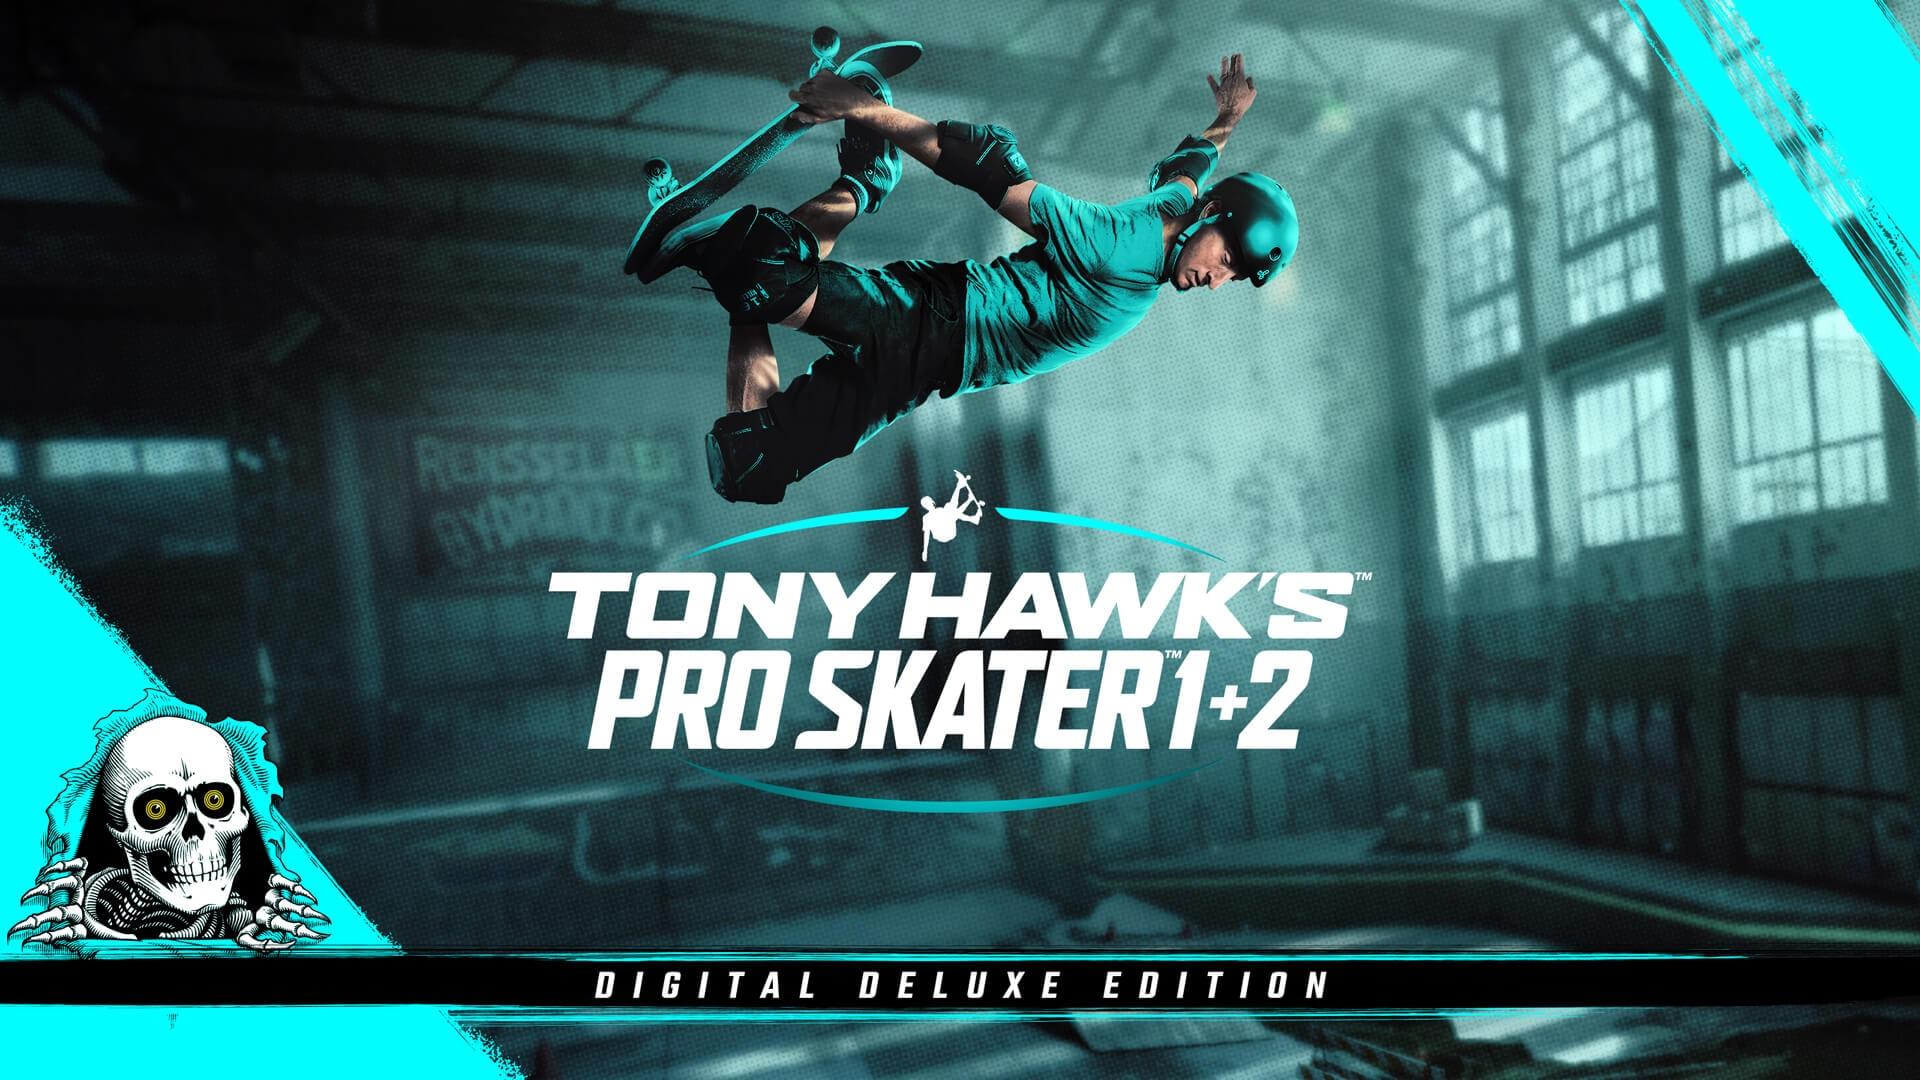 Tony Hawk's Pro Skater 1+2 Deluxe Edition+DLC со скидкой, офлайн, denuvo АВТОАКТИВАЦИЯ | PC (GLOBAL ENG/MULTi) Epic Games